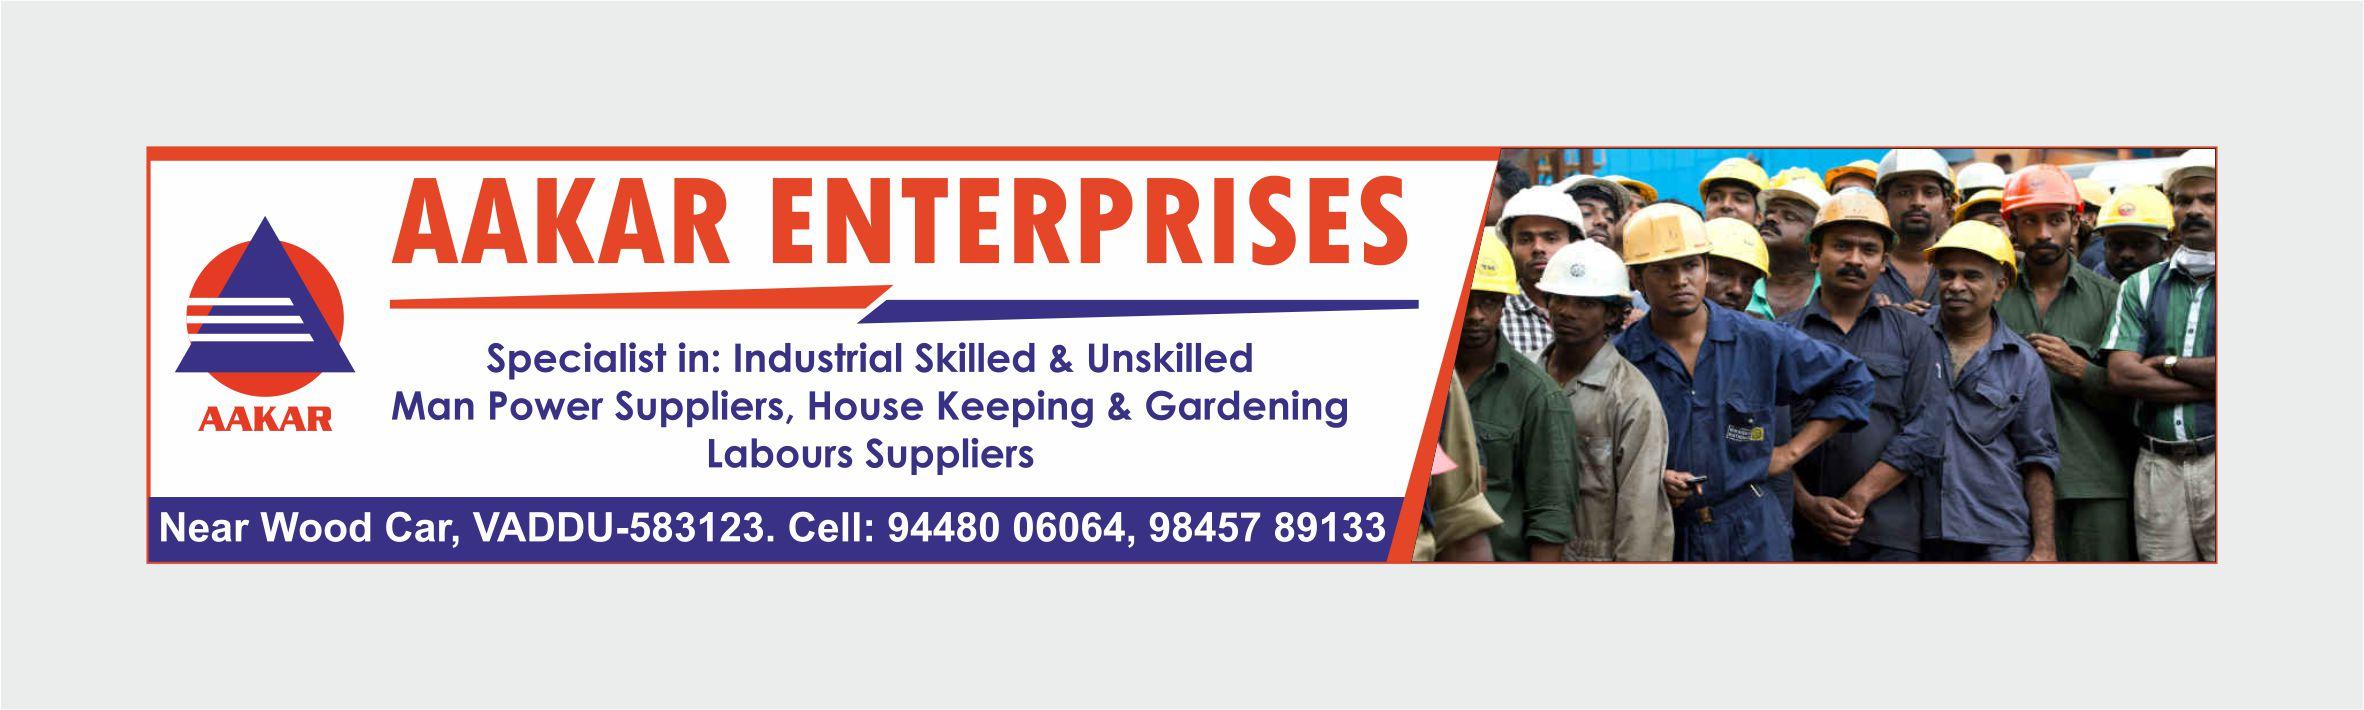 Aakar Enterprises